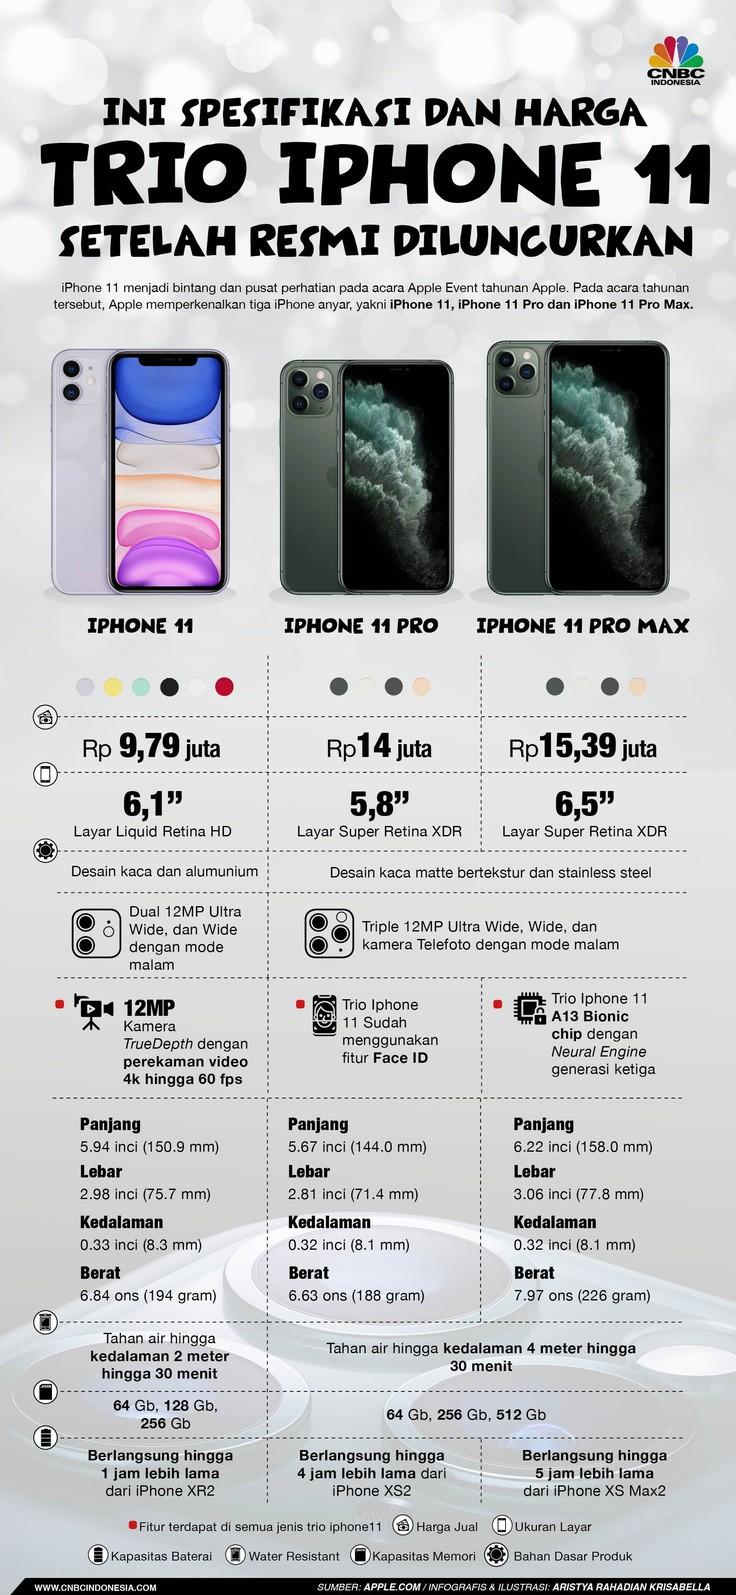 Apple resmi merilis tiga iPhone baru di Steve Jobs Theater, California (AS) tanggal 10 September 2019. Ketiganya: iPhone 11, iPhone 11 Pro, dan iPhone 11 Pro.